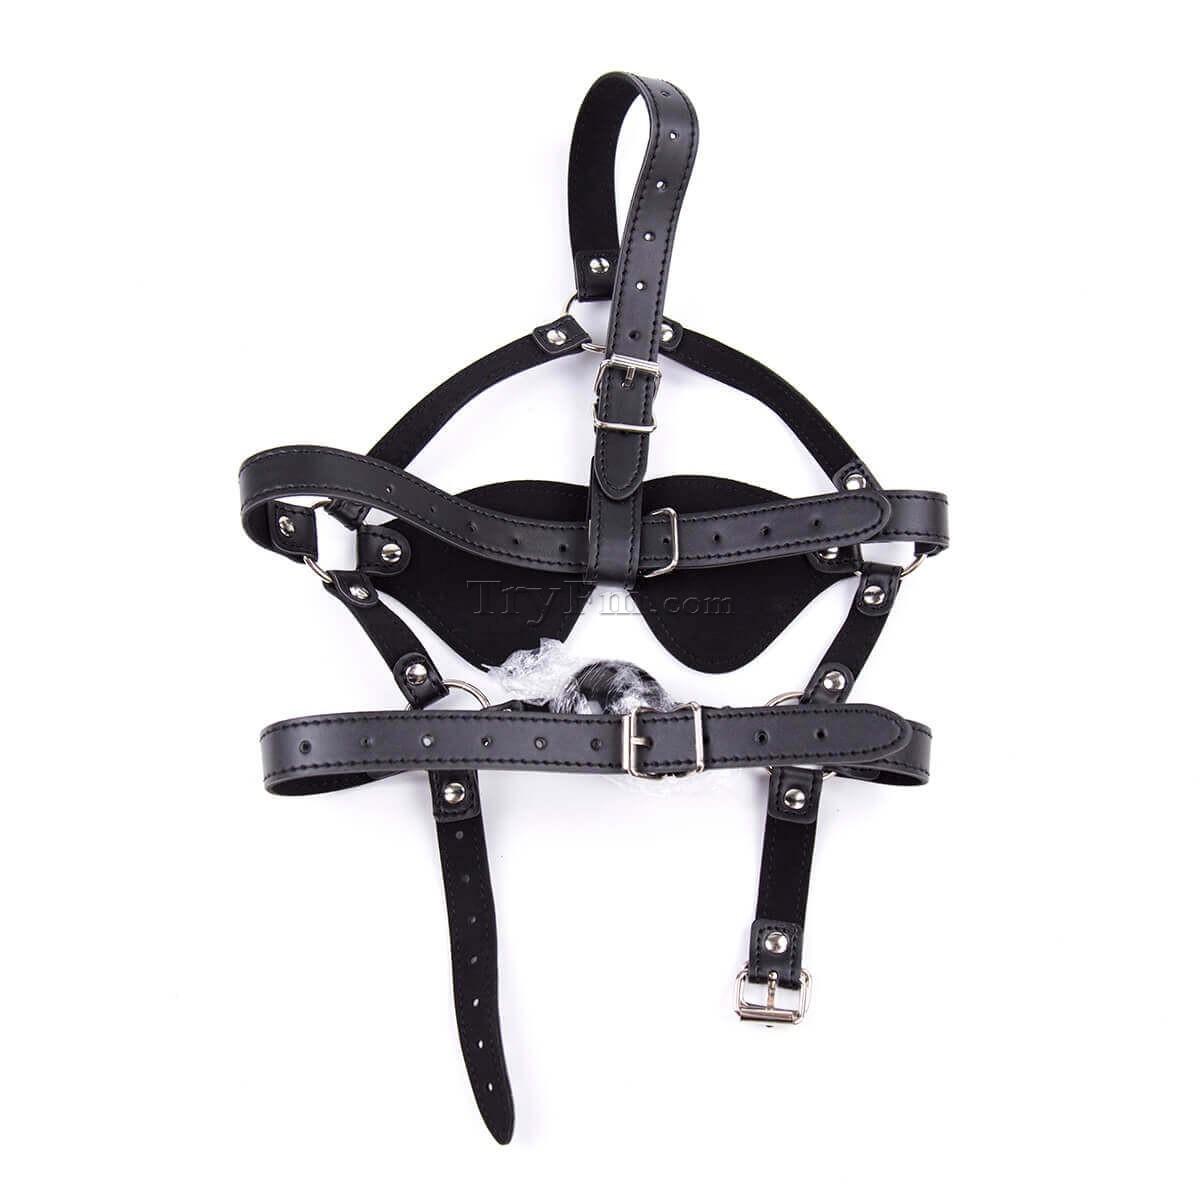 24-Blindfold-Harness-and-Ball-Gag-10.jpg